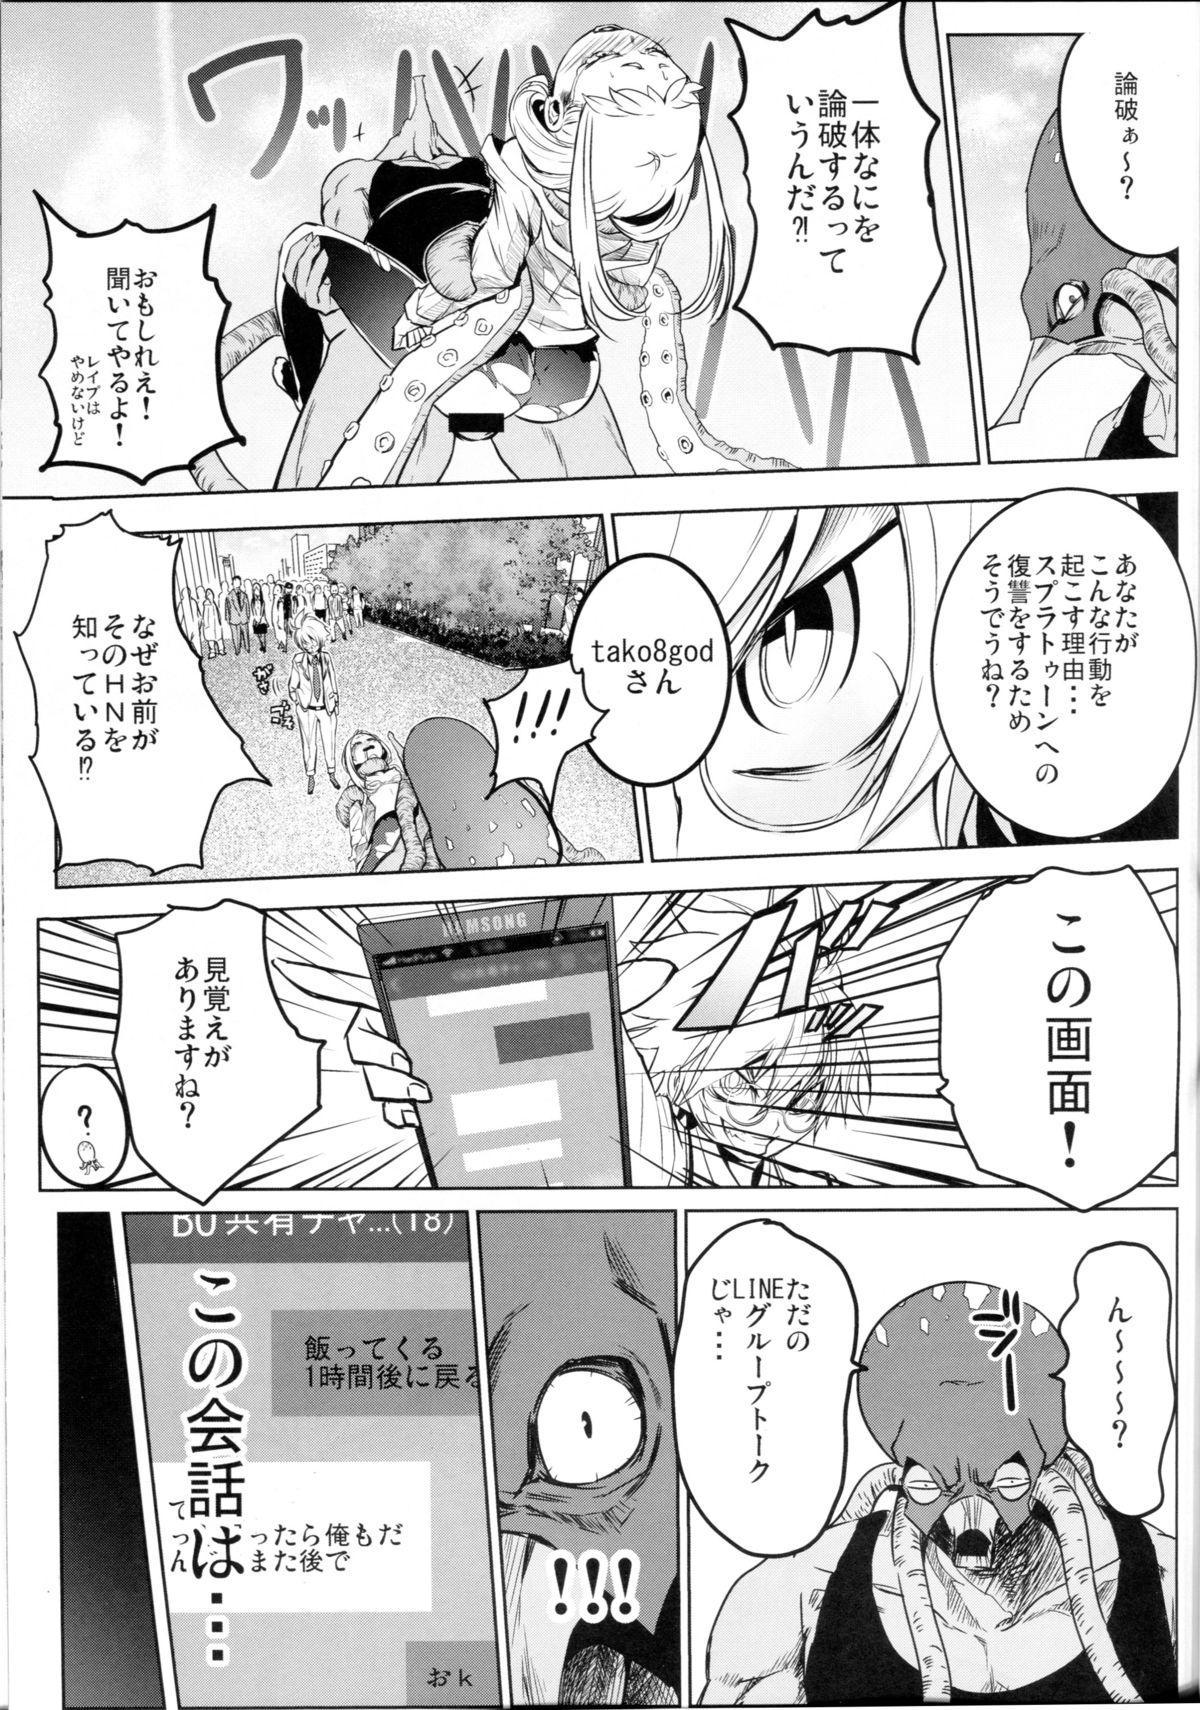 Saredo Uraraka ni! Ikari no Gachimacchi - Still Behave Uraraka! 16